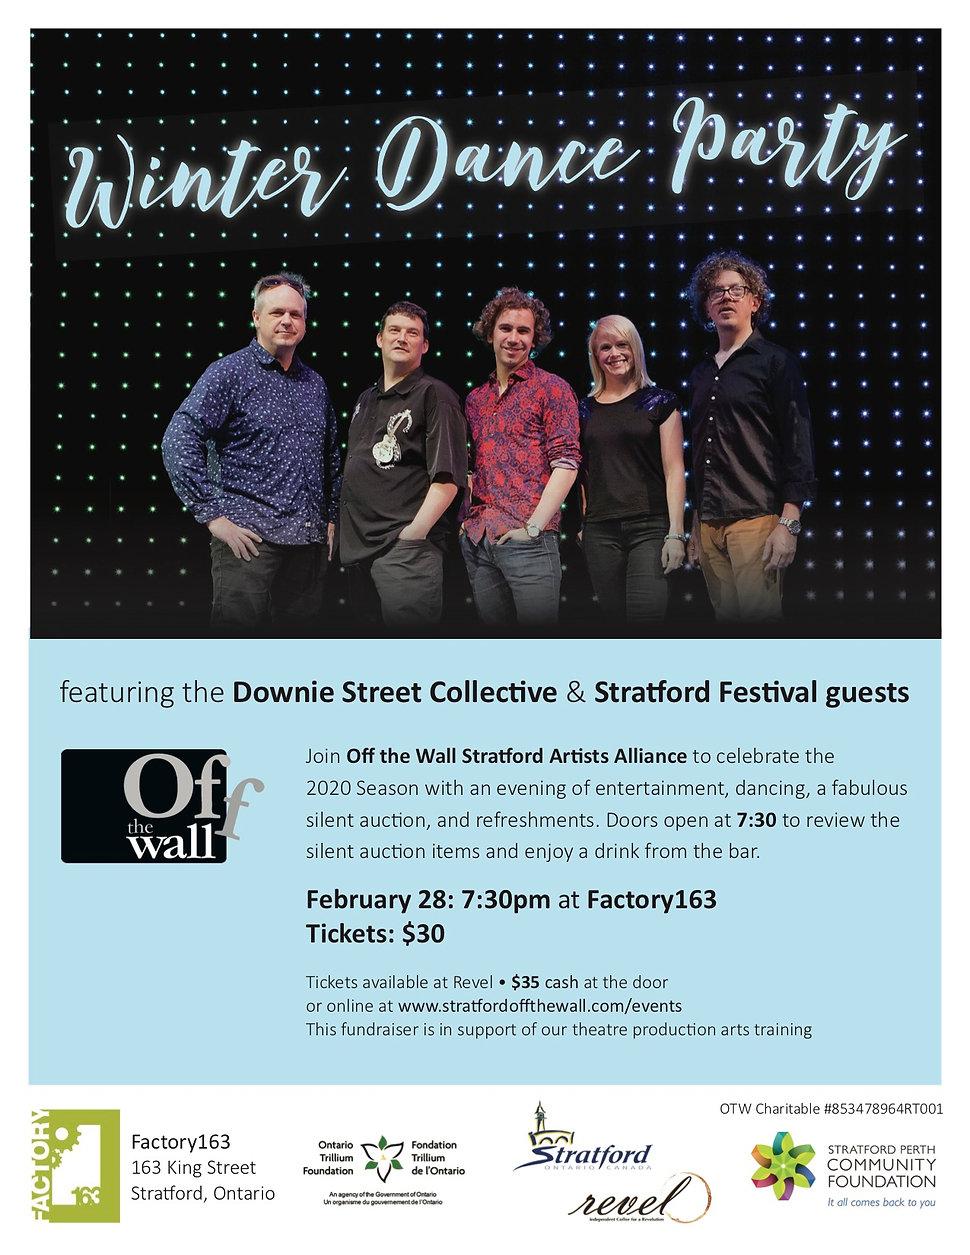 OTW dance party poster 2019.jpg